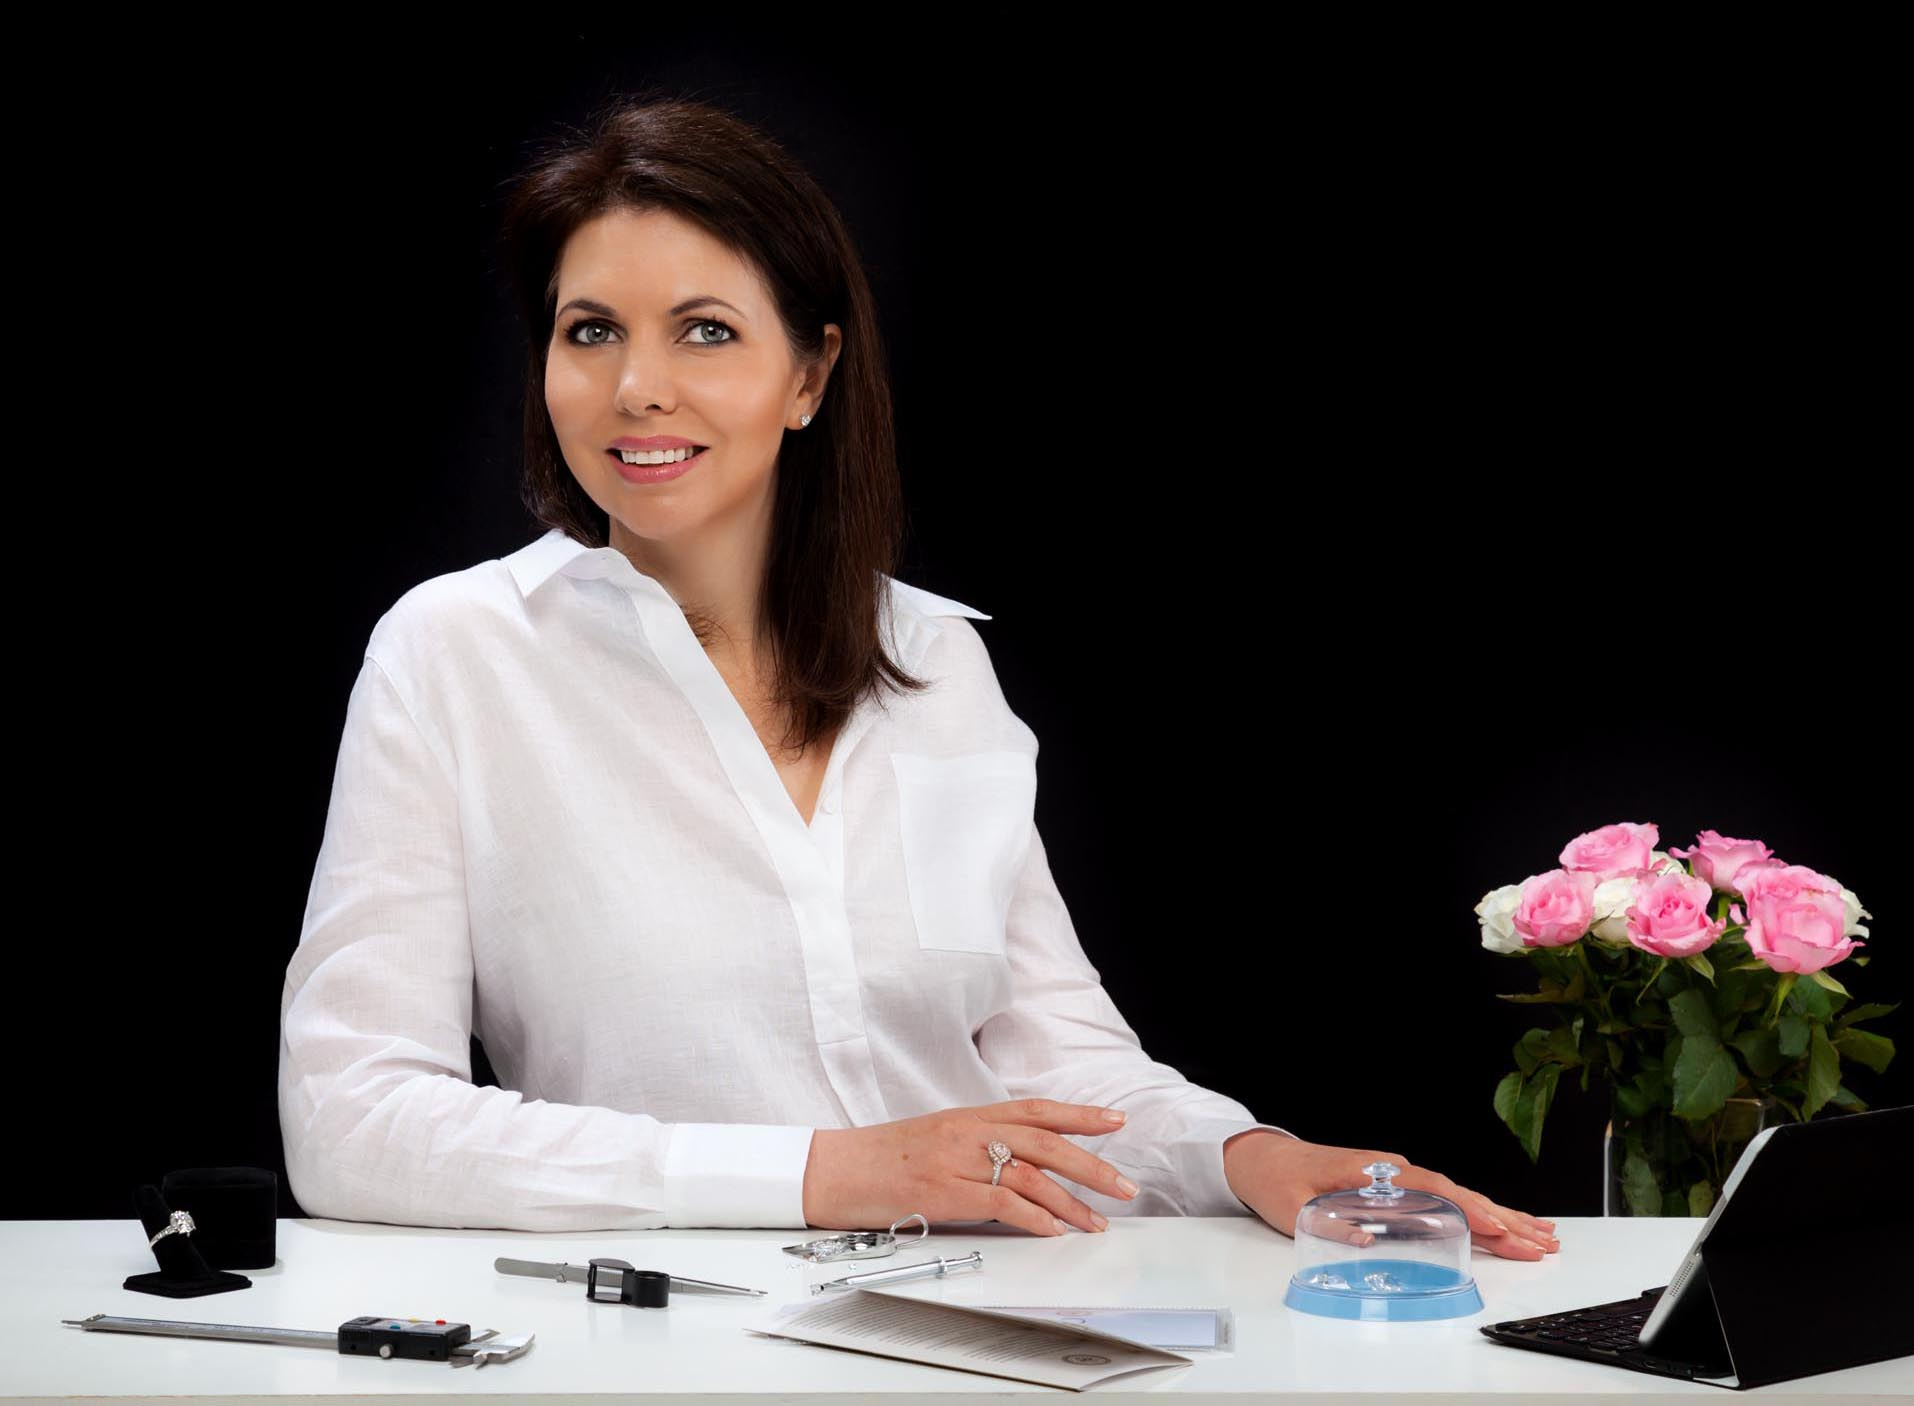 lady at deskjpg